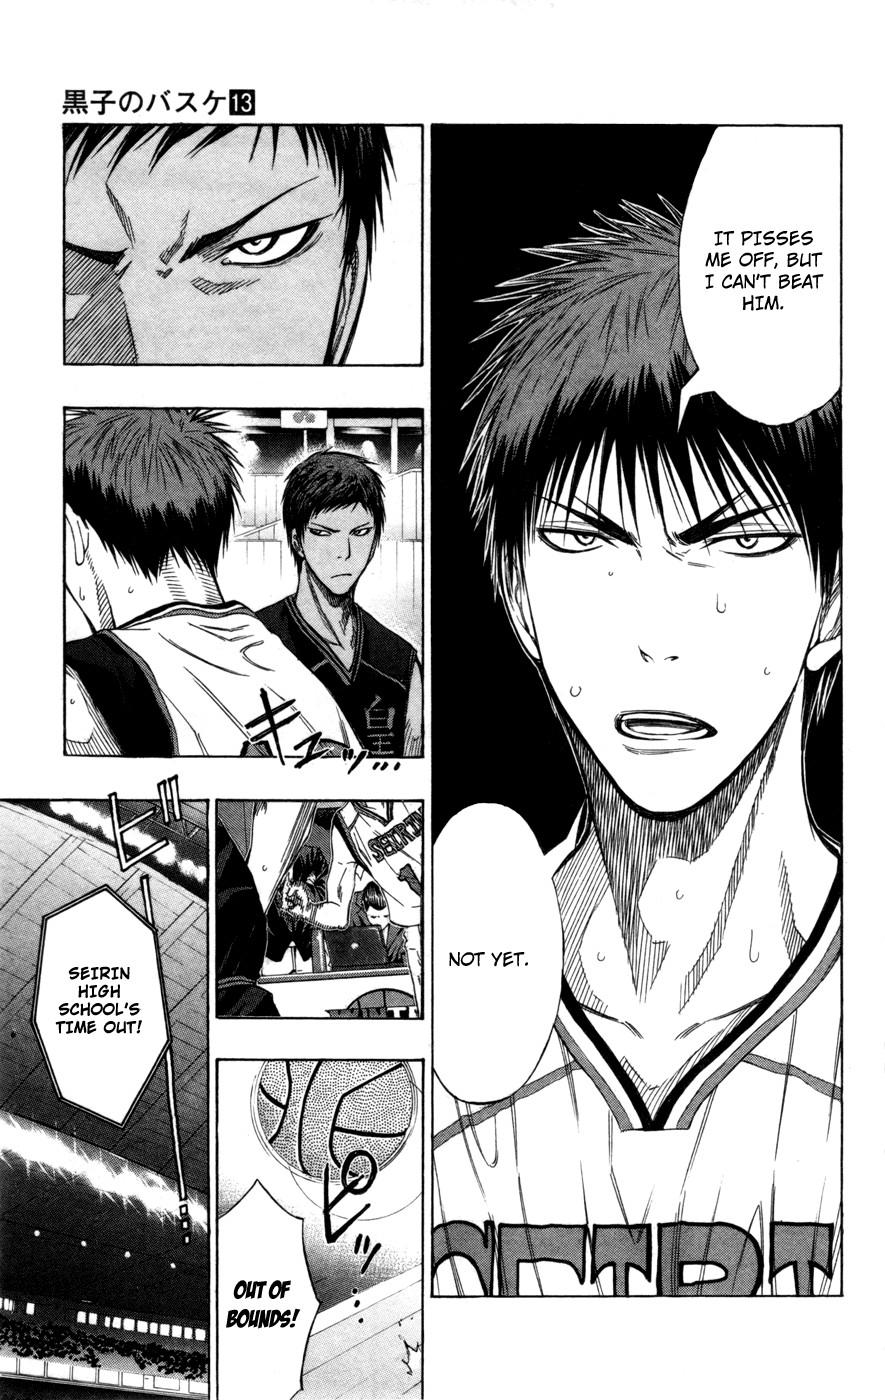 Kuroko no Basket Manga Chapter 117 - Image 3_177